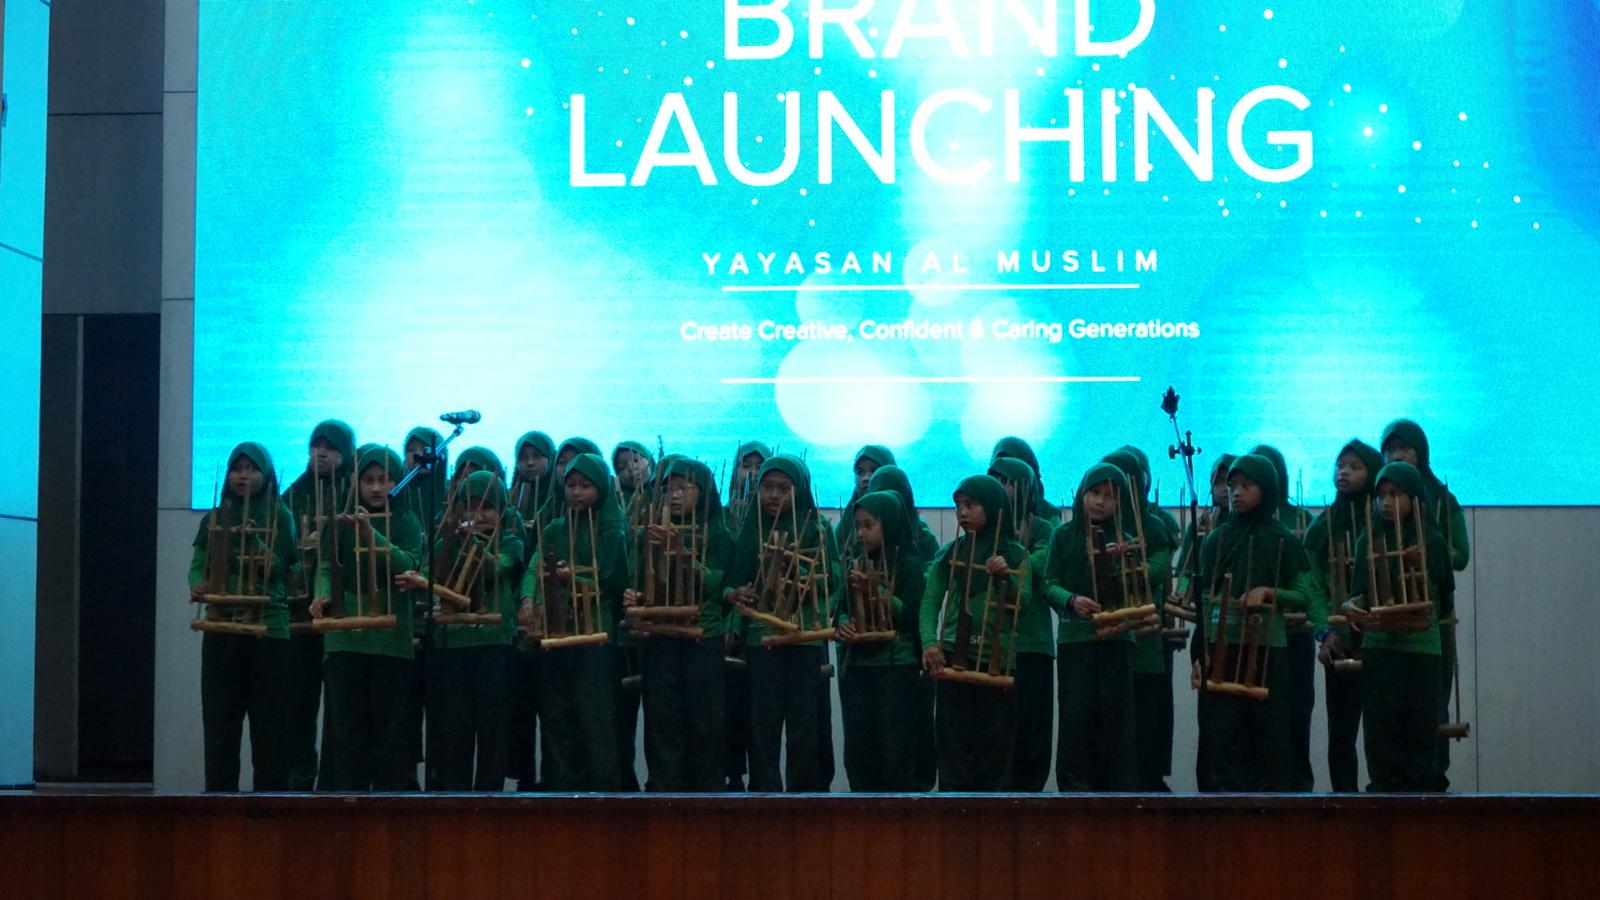 Brand Launching Al Muslim